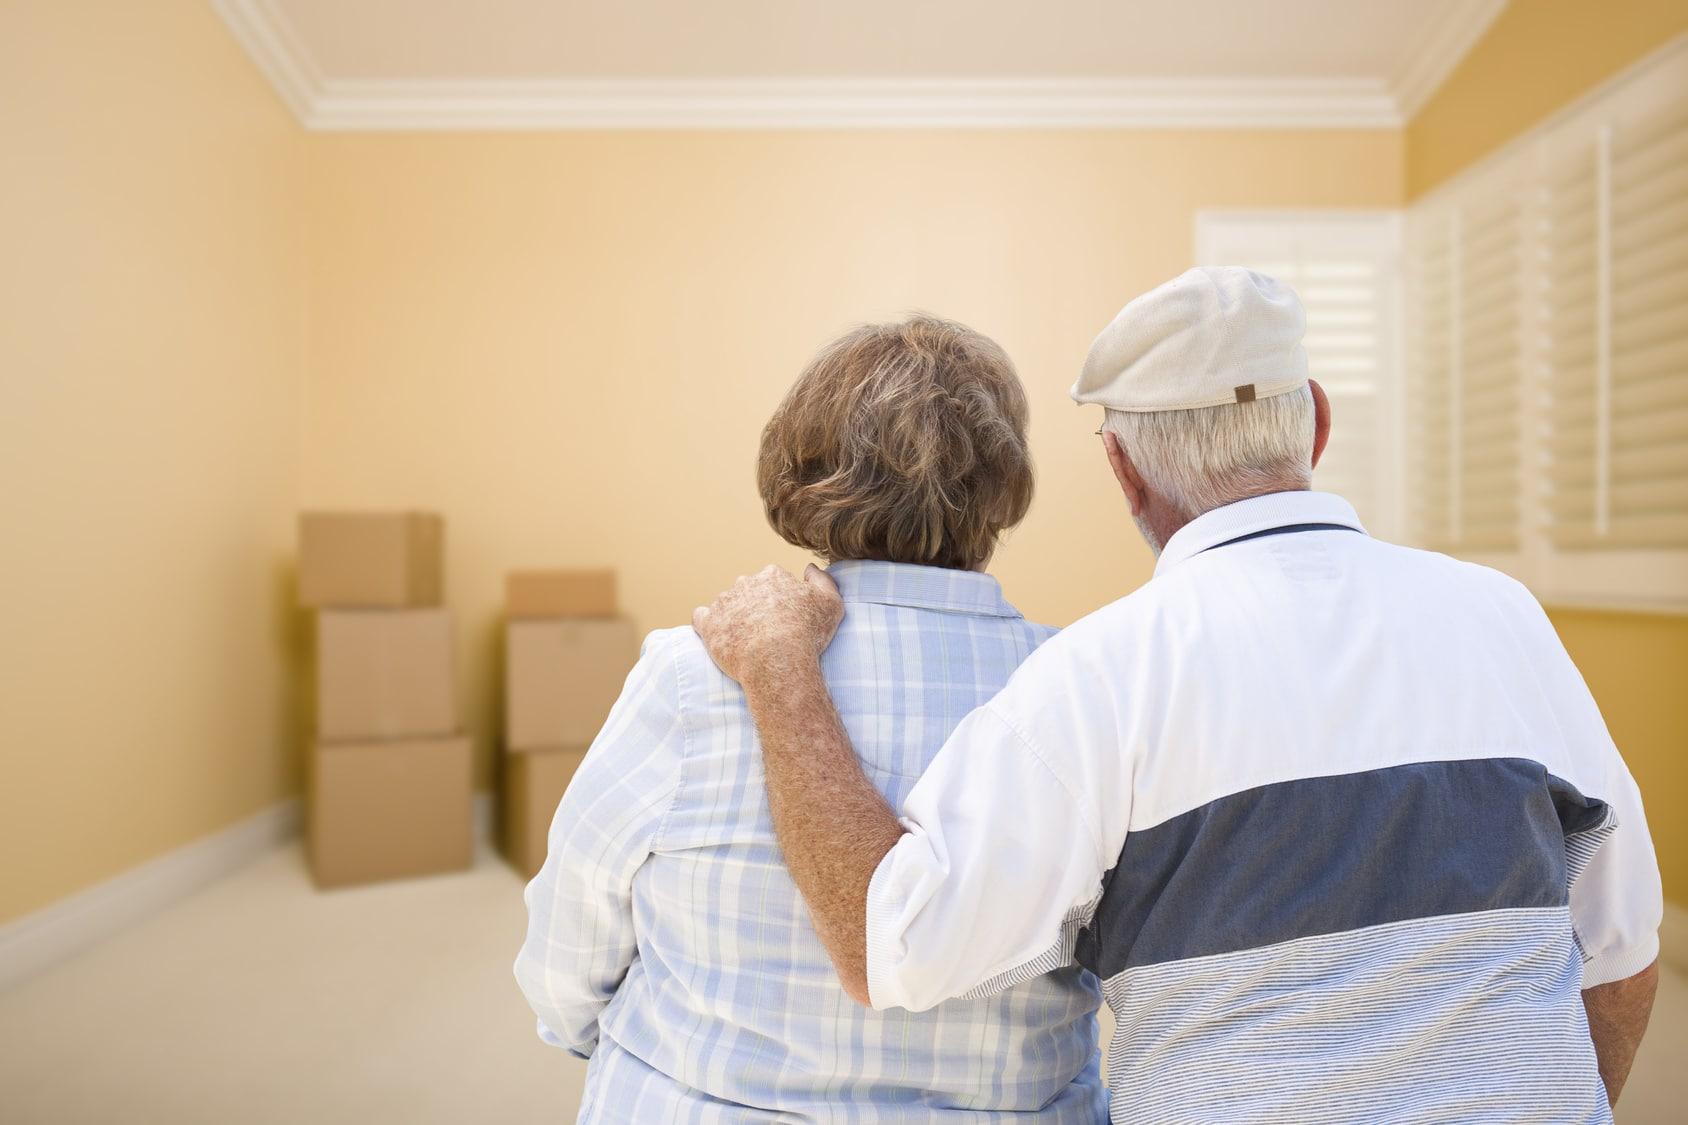 Columbus Movers Top 5 List of Retirement Spots